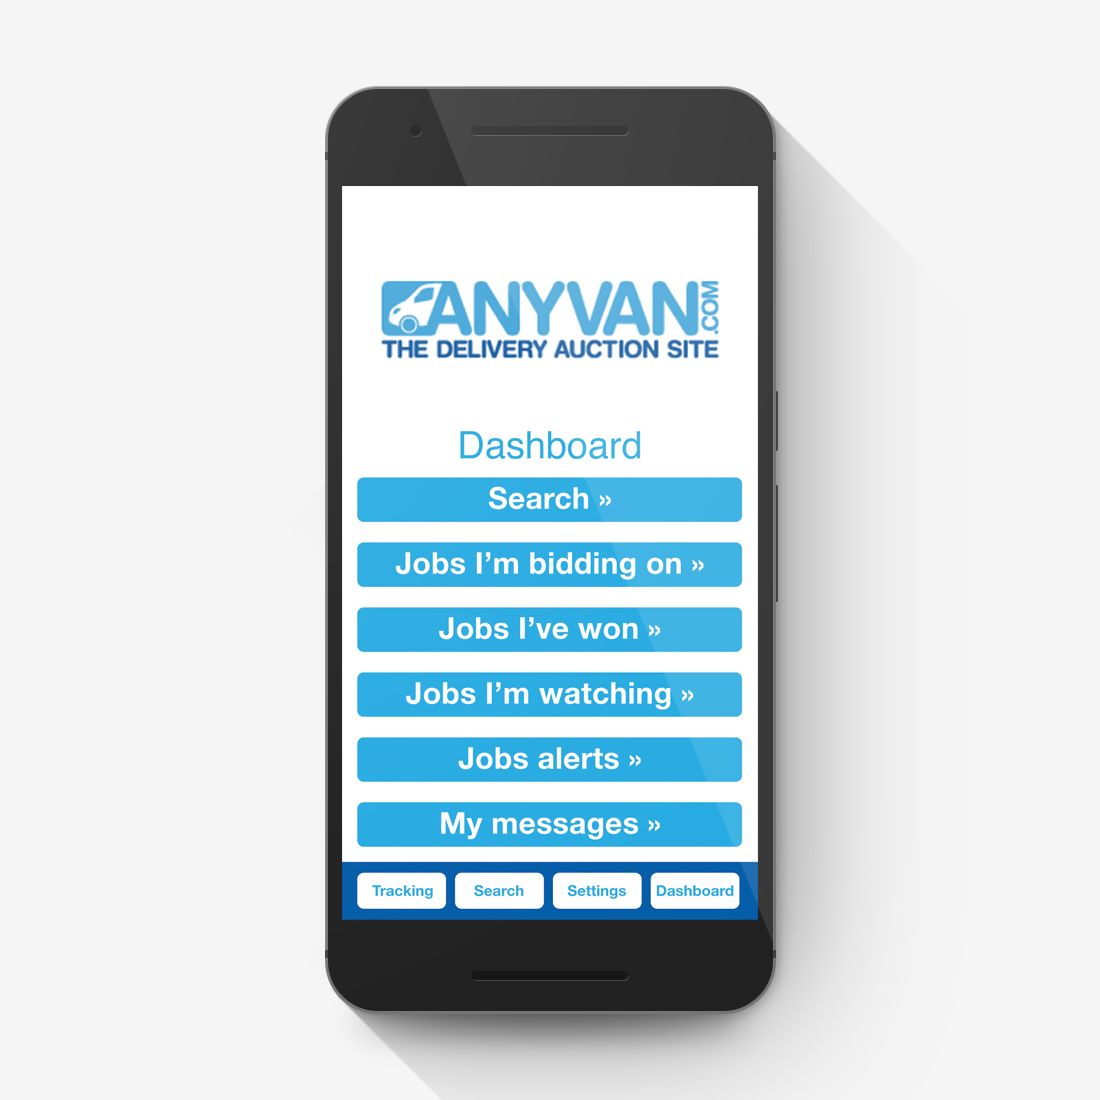 App interface design for a van livery service. govicinity#Branding #Logo #LogoDesign #Identity #GraphicDesign #LogoInspiration #Brand #Logothorn#Logoplace #DesignInspiration #GoVicinity #DesignAgency #Designer #DesignStudio #UI #UIDesign #App #AppDesign #UserInterface #UserInterfaceDesign #Bed #Revolutionary #Mobile #Phone